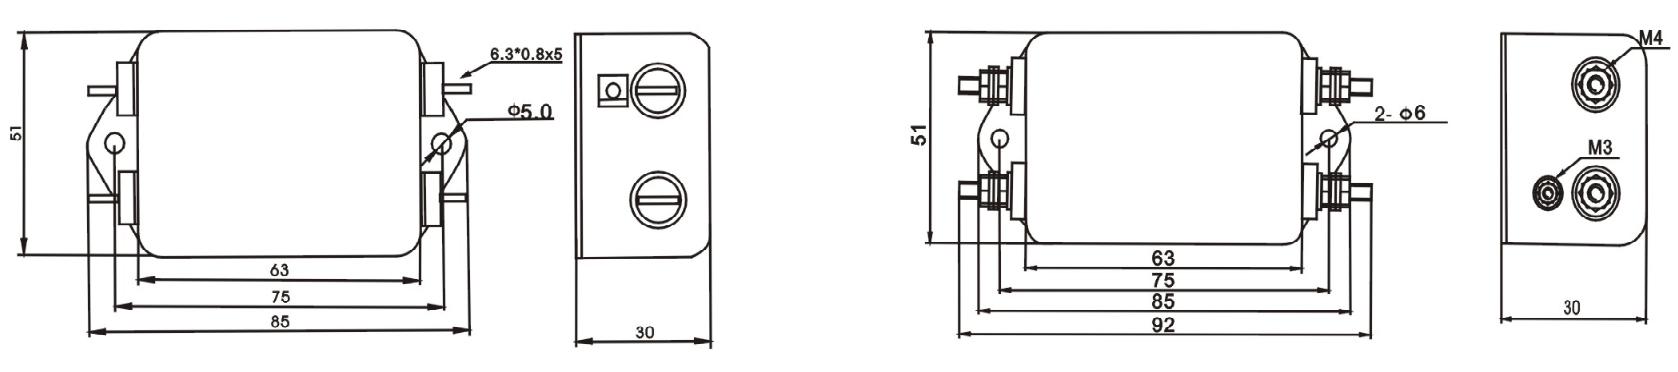 DAA1  Series EMI power noise filters (3)